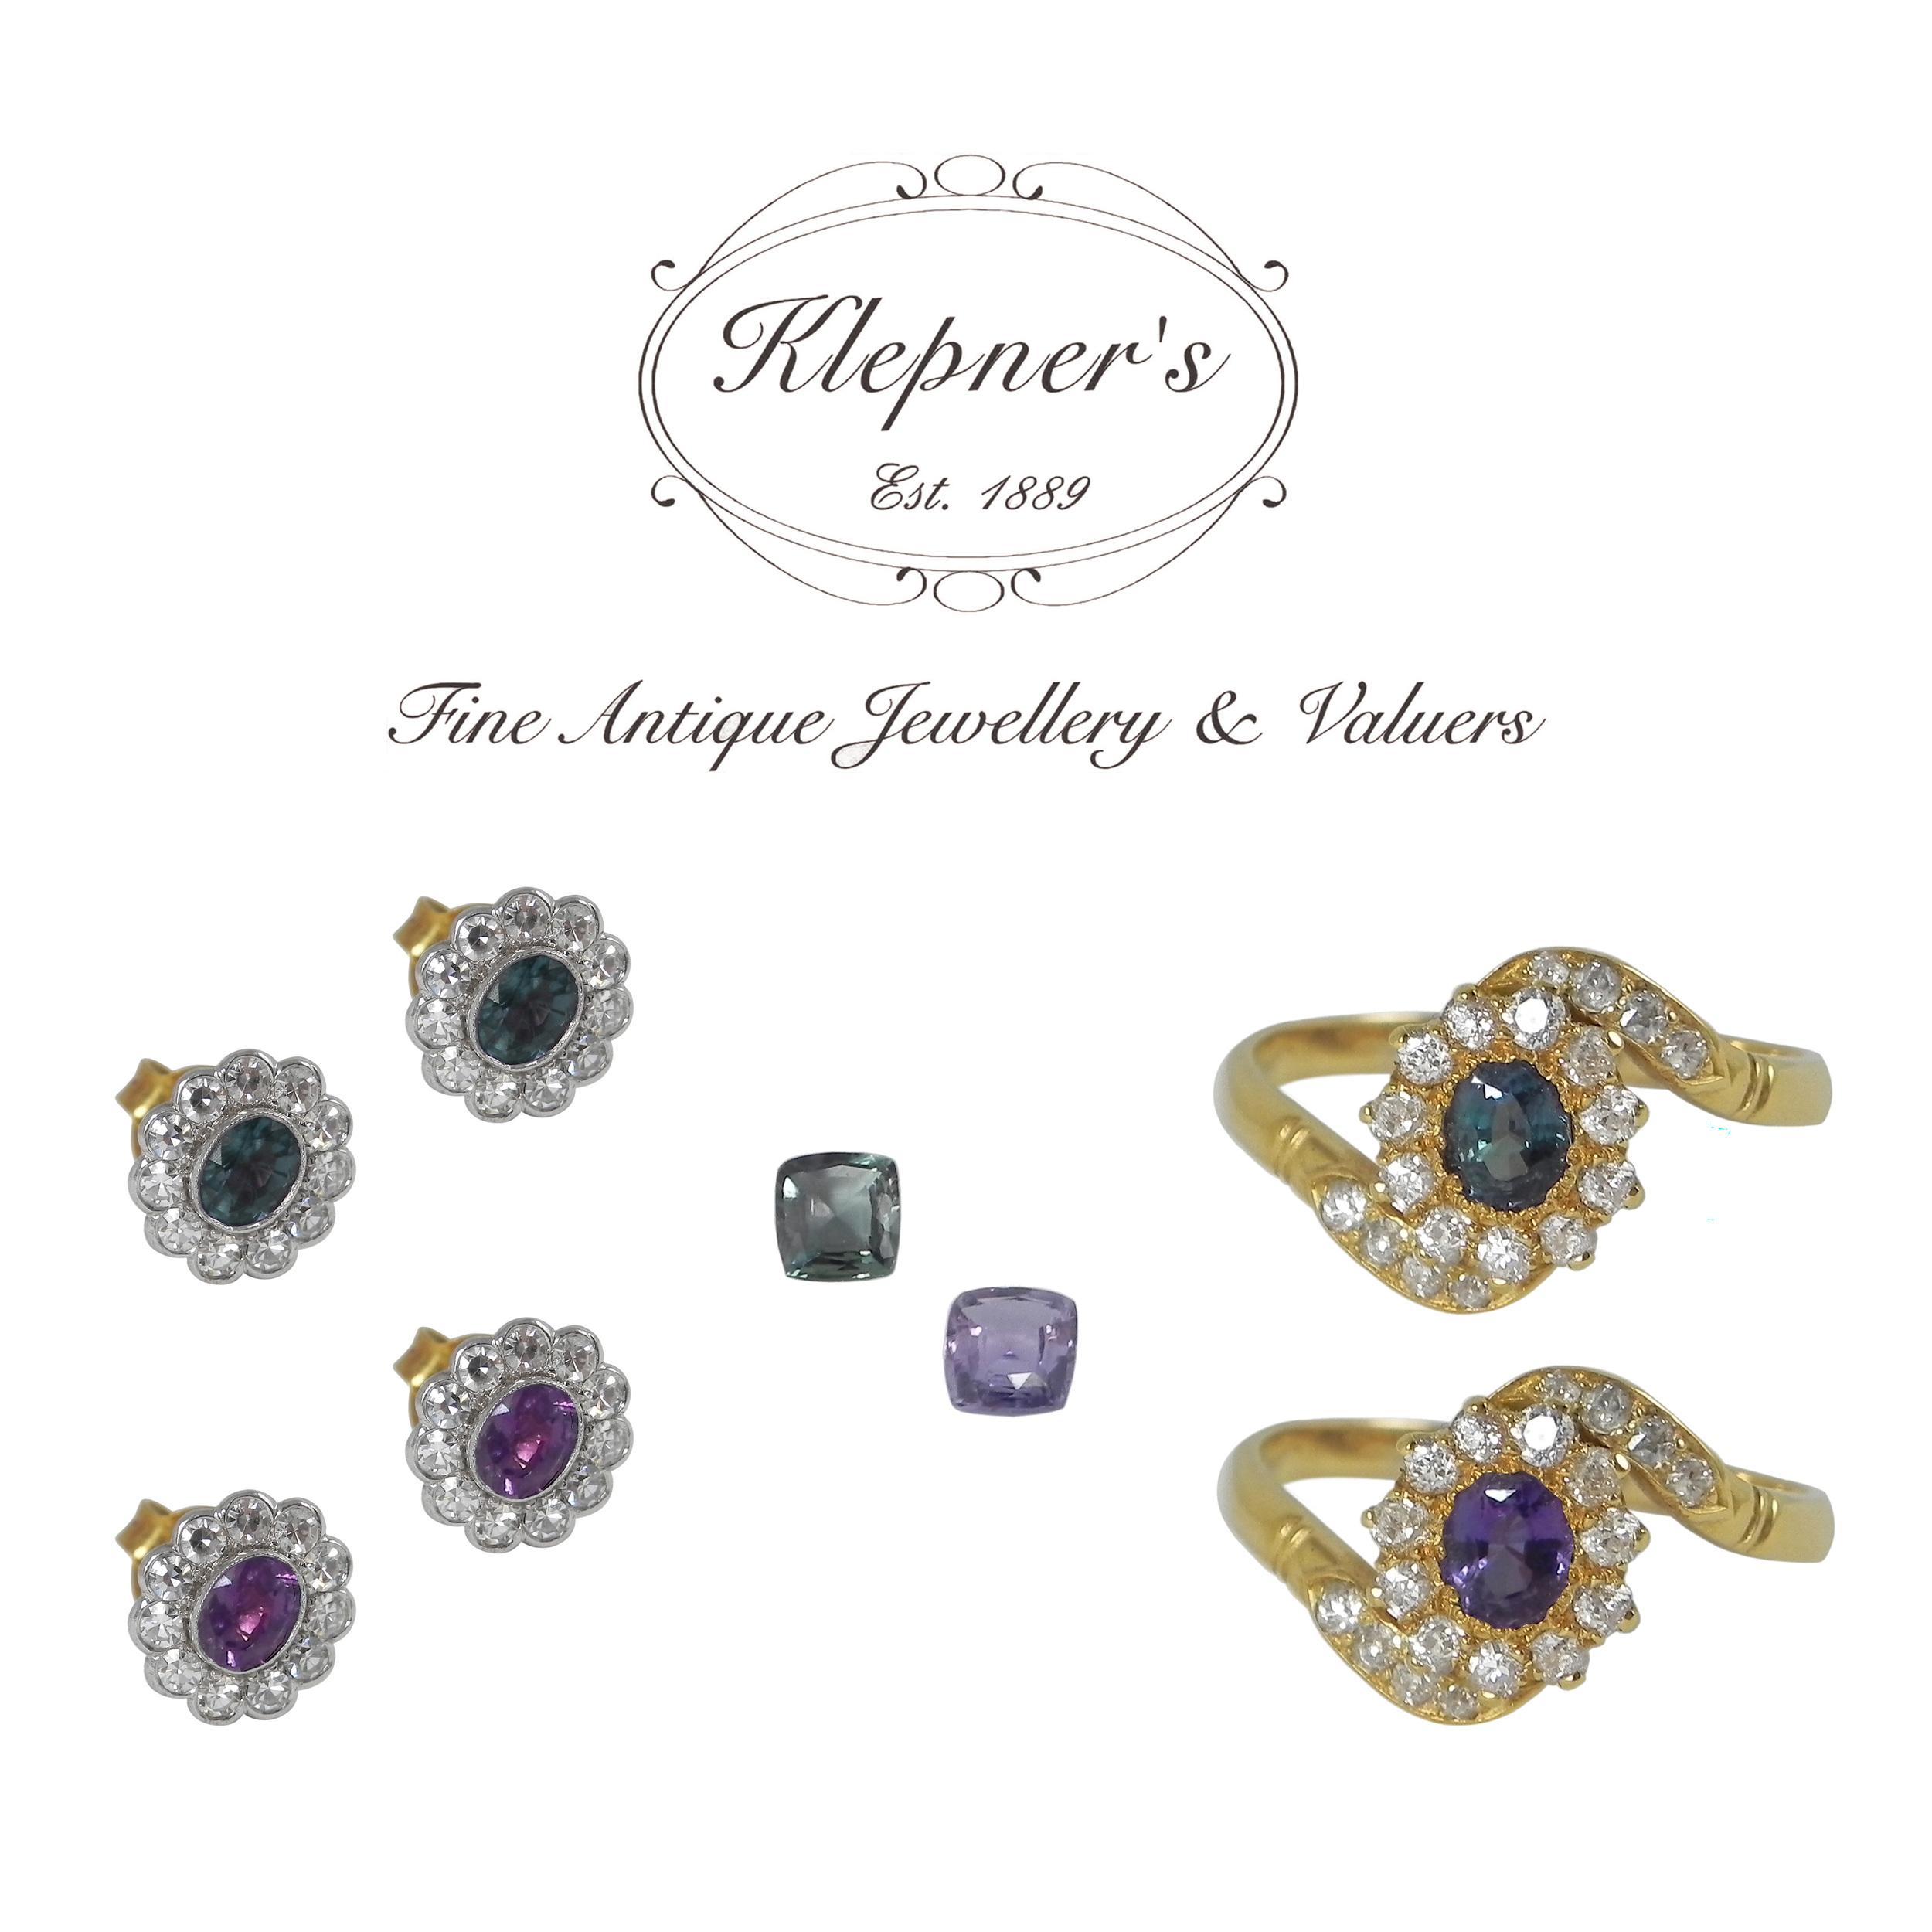 Natural Colour Change Alexandrite and Garnet Jewellery.jpg